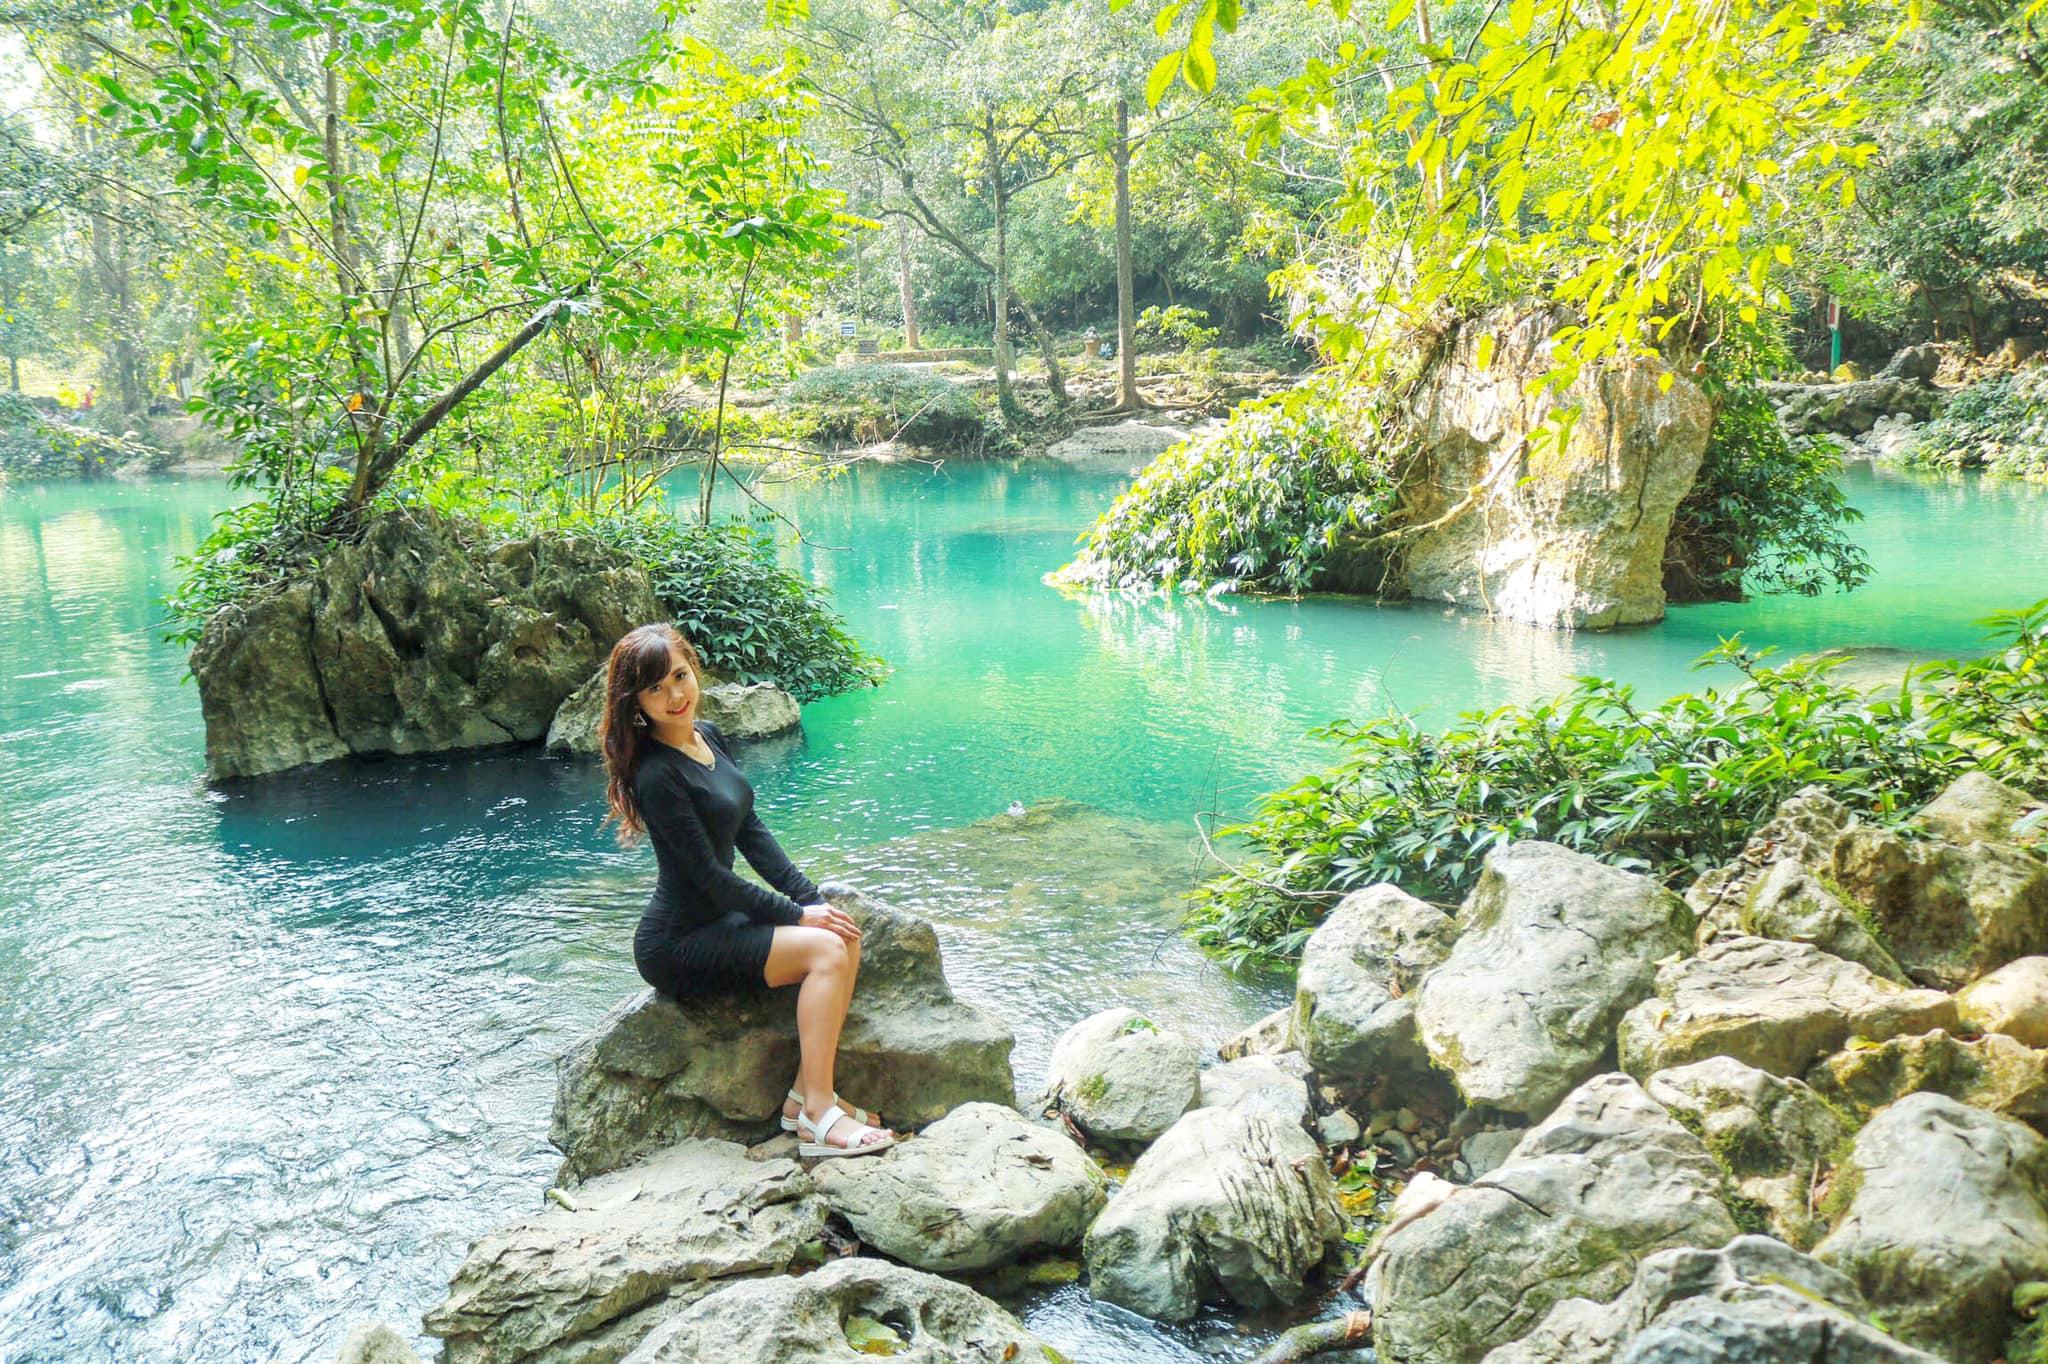 Suoi-le-nin-nang-tho-cua-manh-dat-cao-bang-vietmountain-travel1